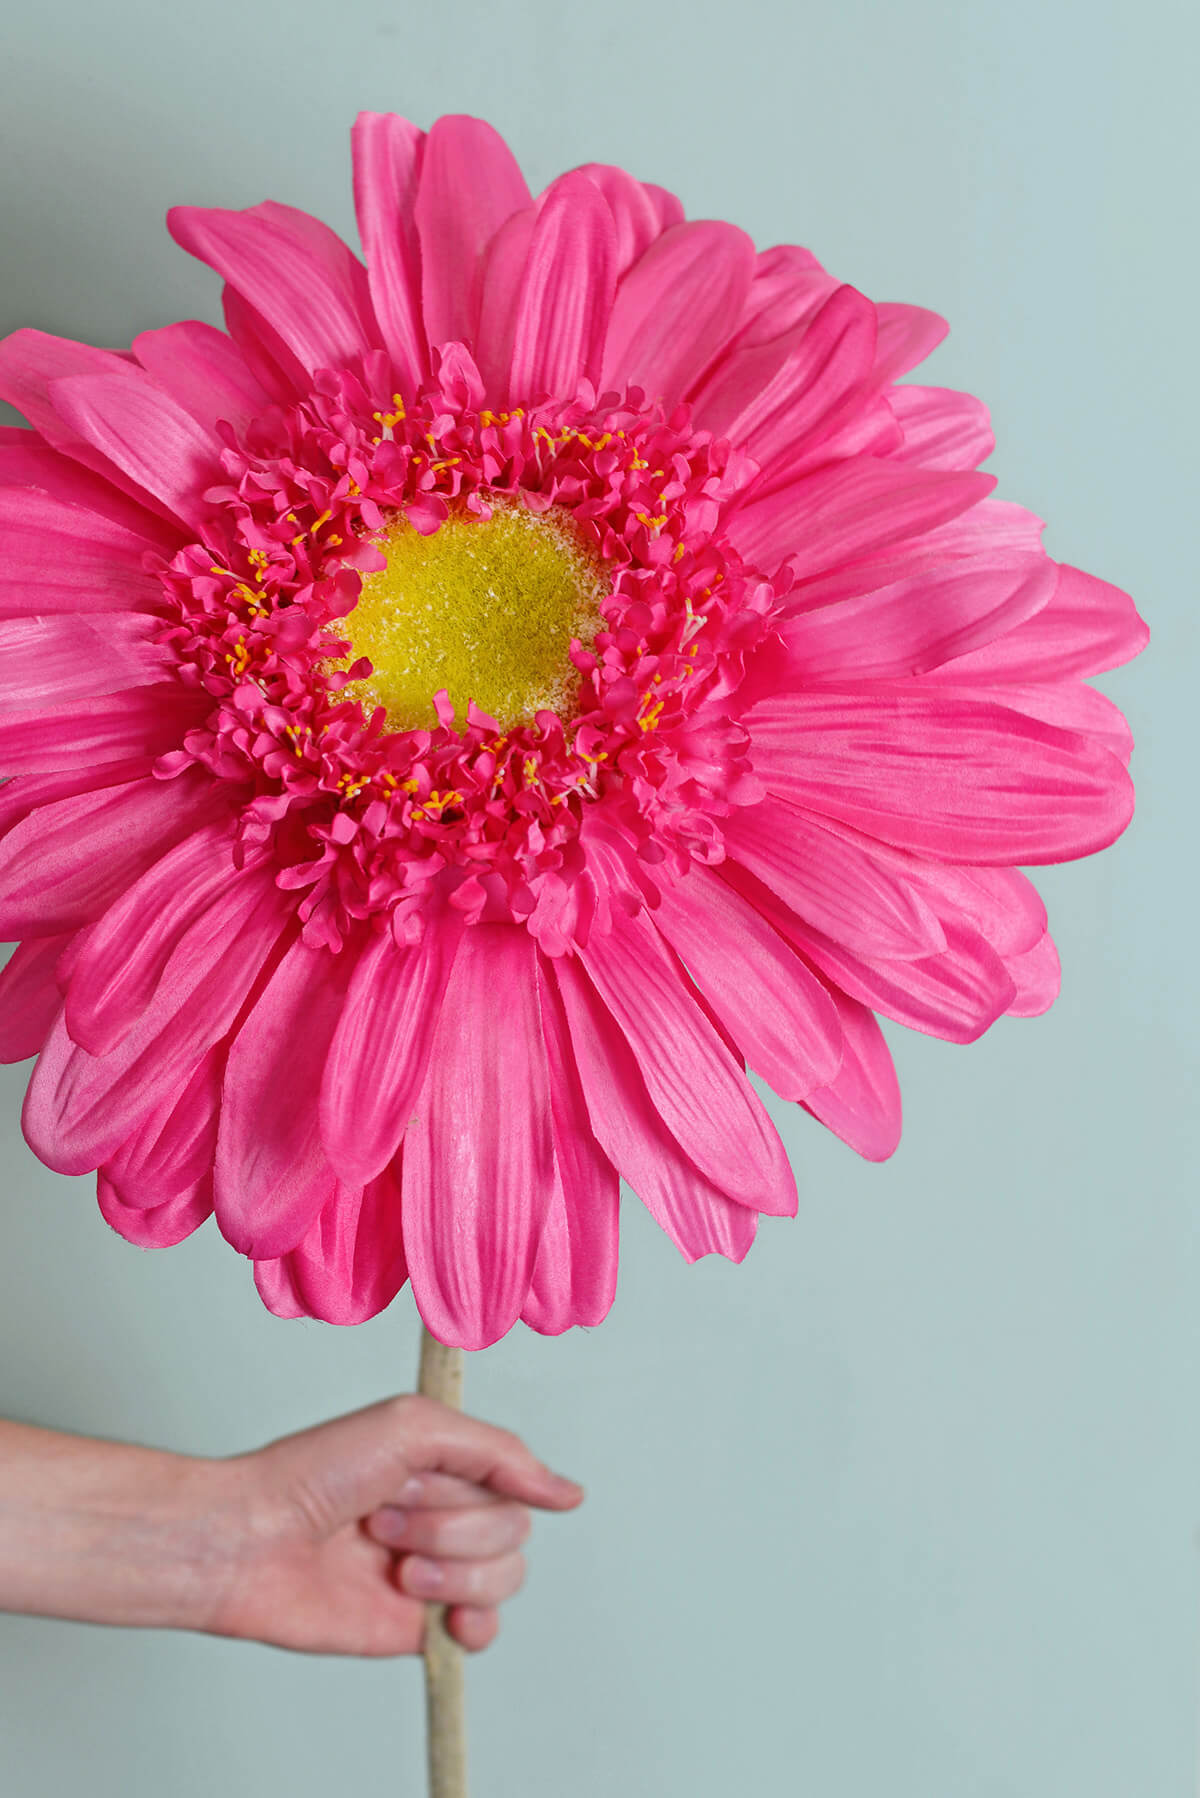 34 silk jumbo ruffle gerbera daisy flower spray cerise pink. Black Bedroom Furniture Sets. Home Design Ideas